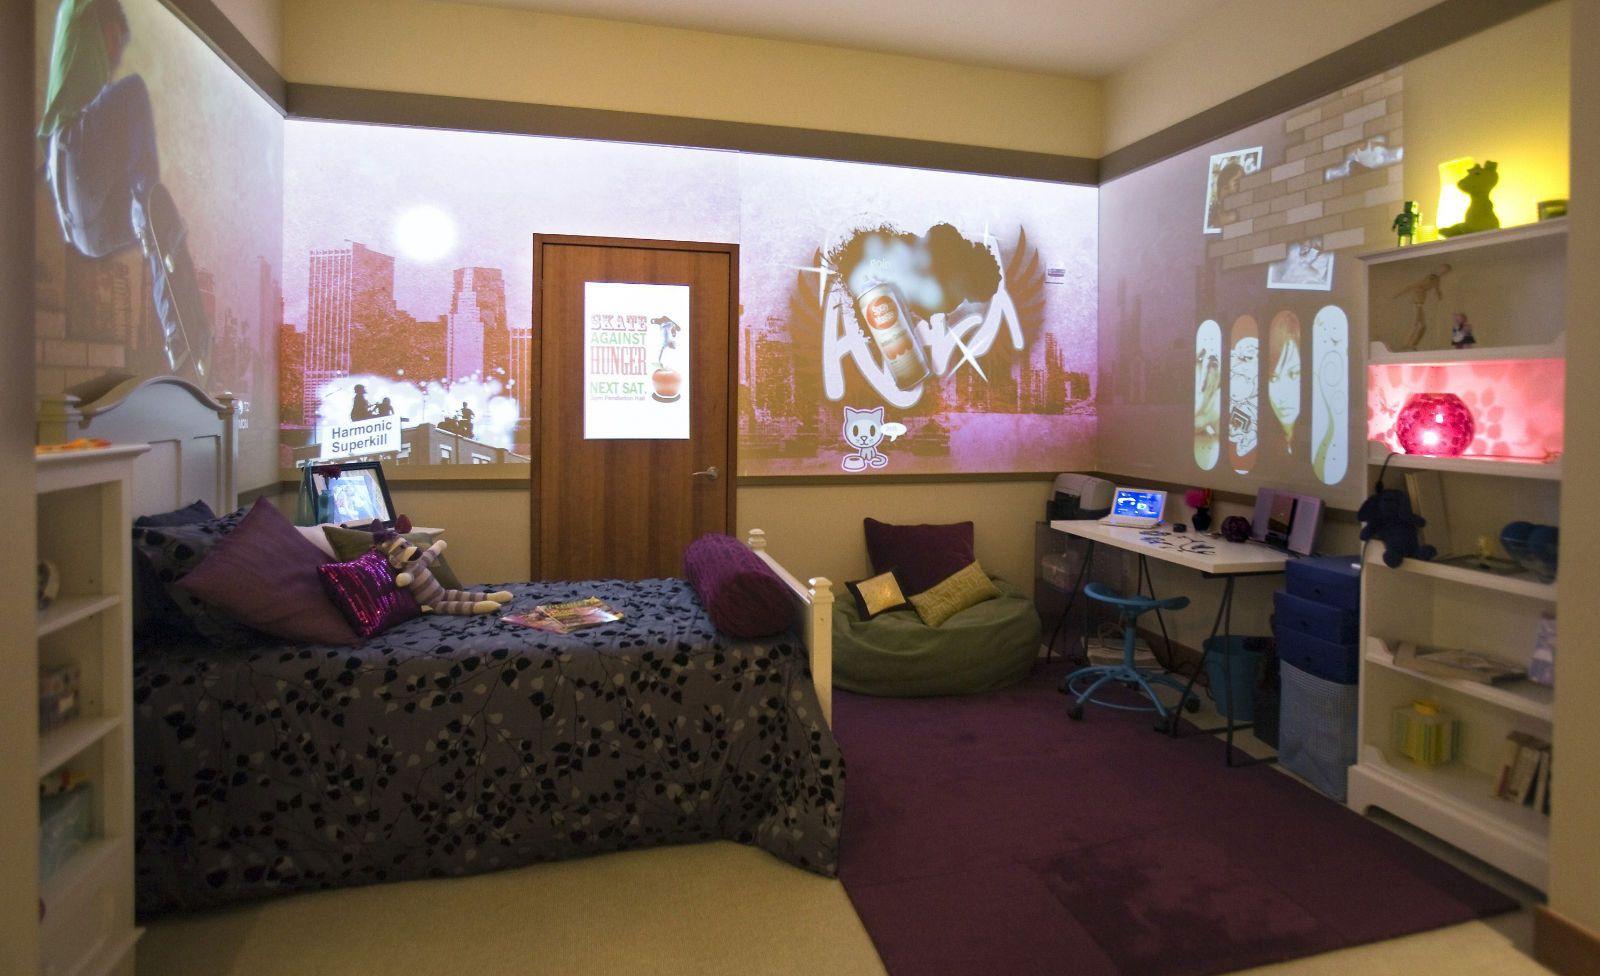 Messy Teenage Bedrooms Girls Bedroom Messy Google Search Teen Girls Bedroom Ideas